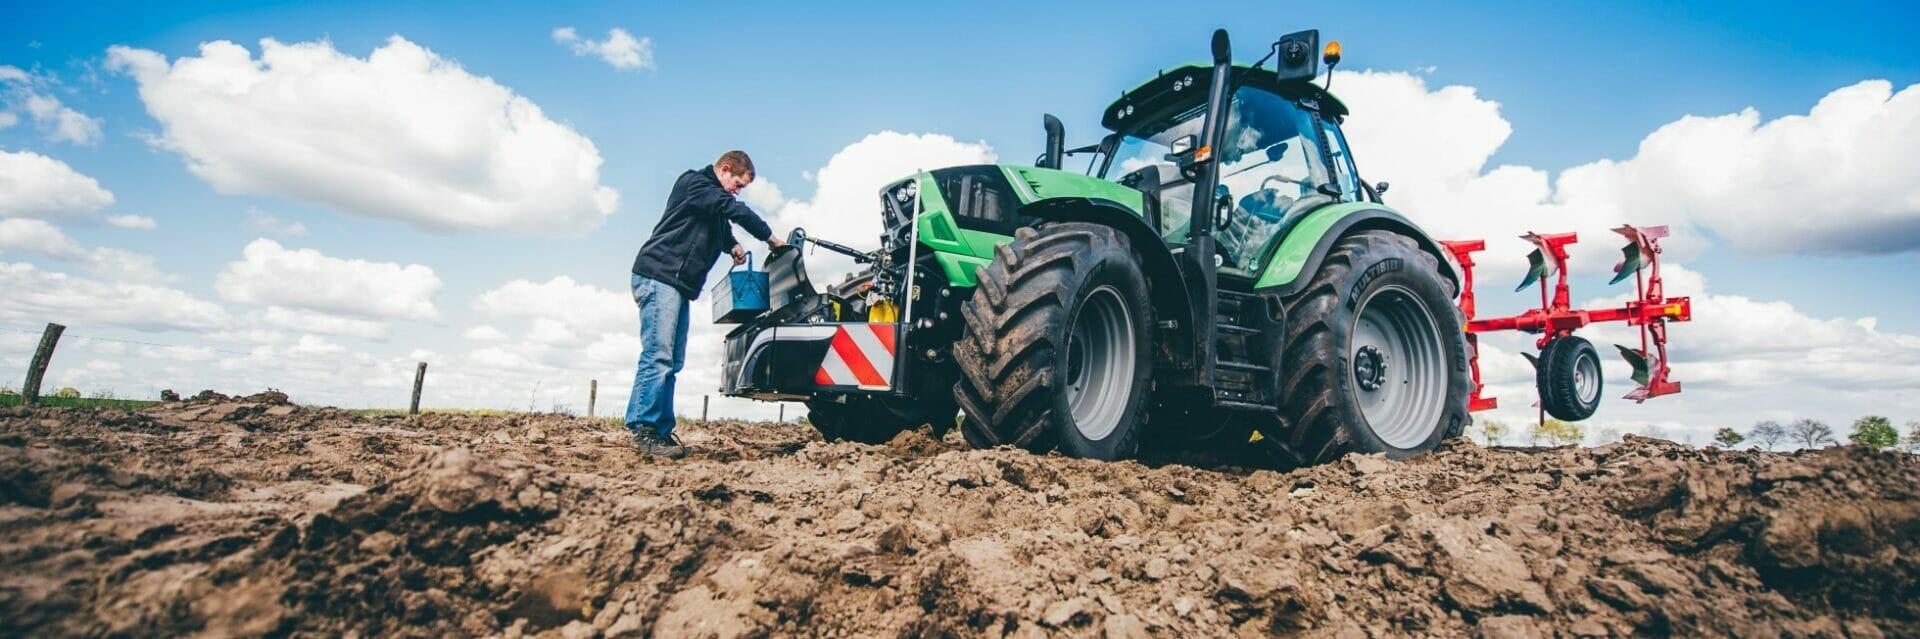 Unterfahrschutz-Traktoren-Auffahrschutz